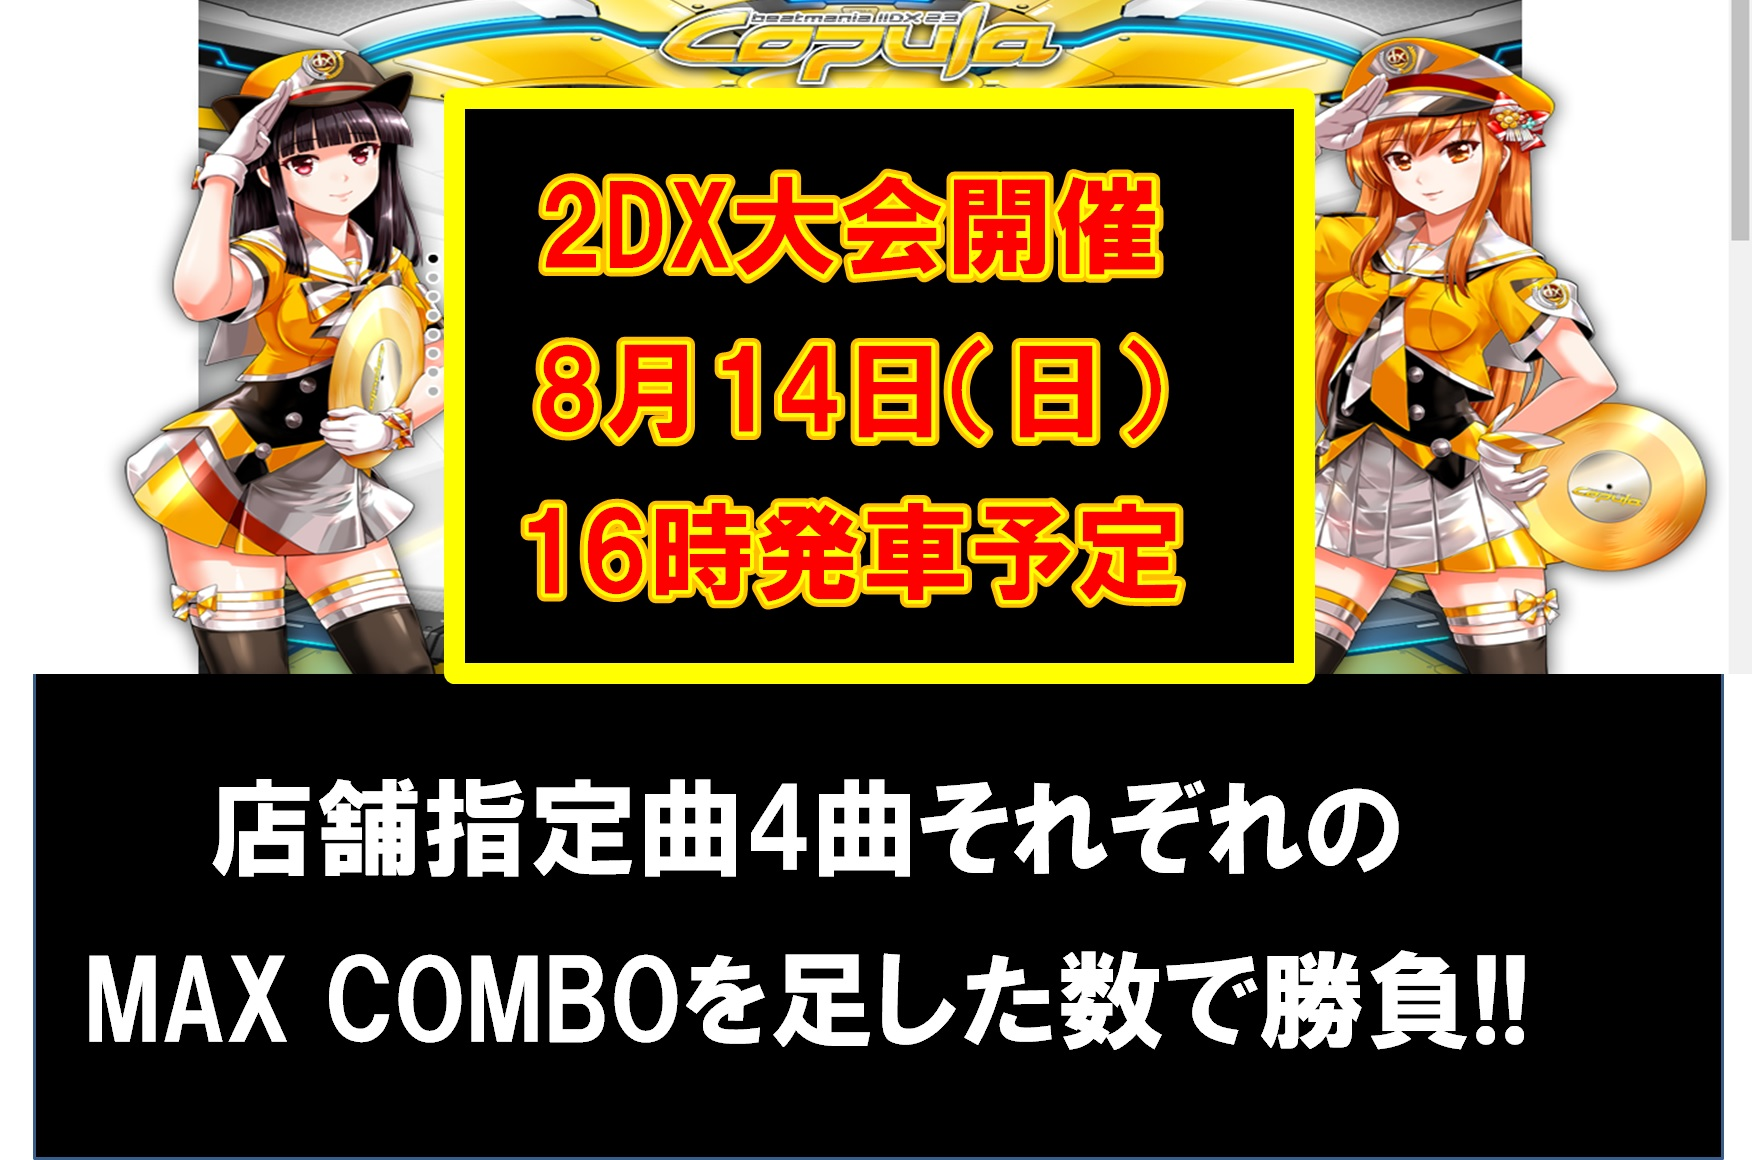 1608 2DX大会2